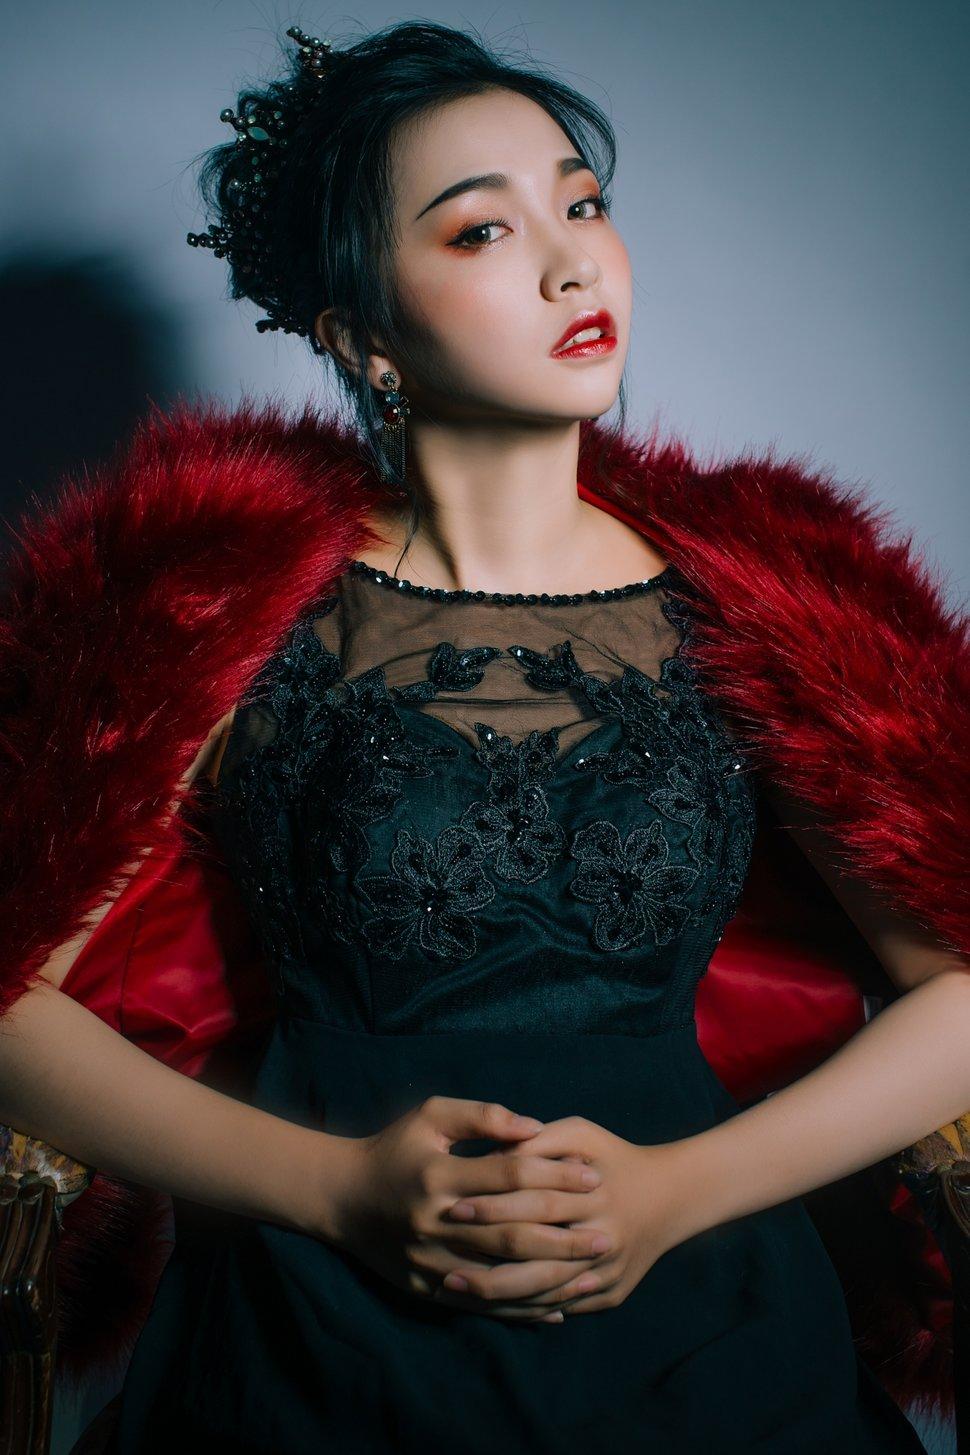 20180801_181121_0025 - Zona時尚美甲x新娘秘書整體造型工作室《結婚吧》